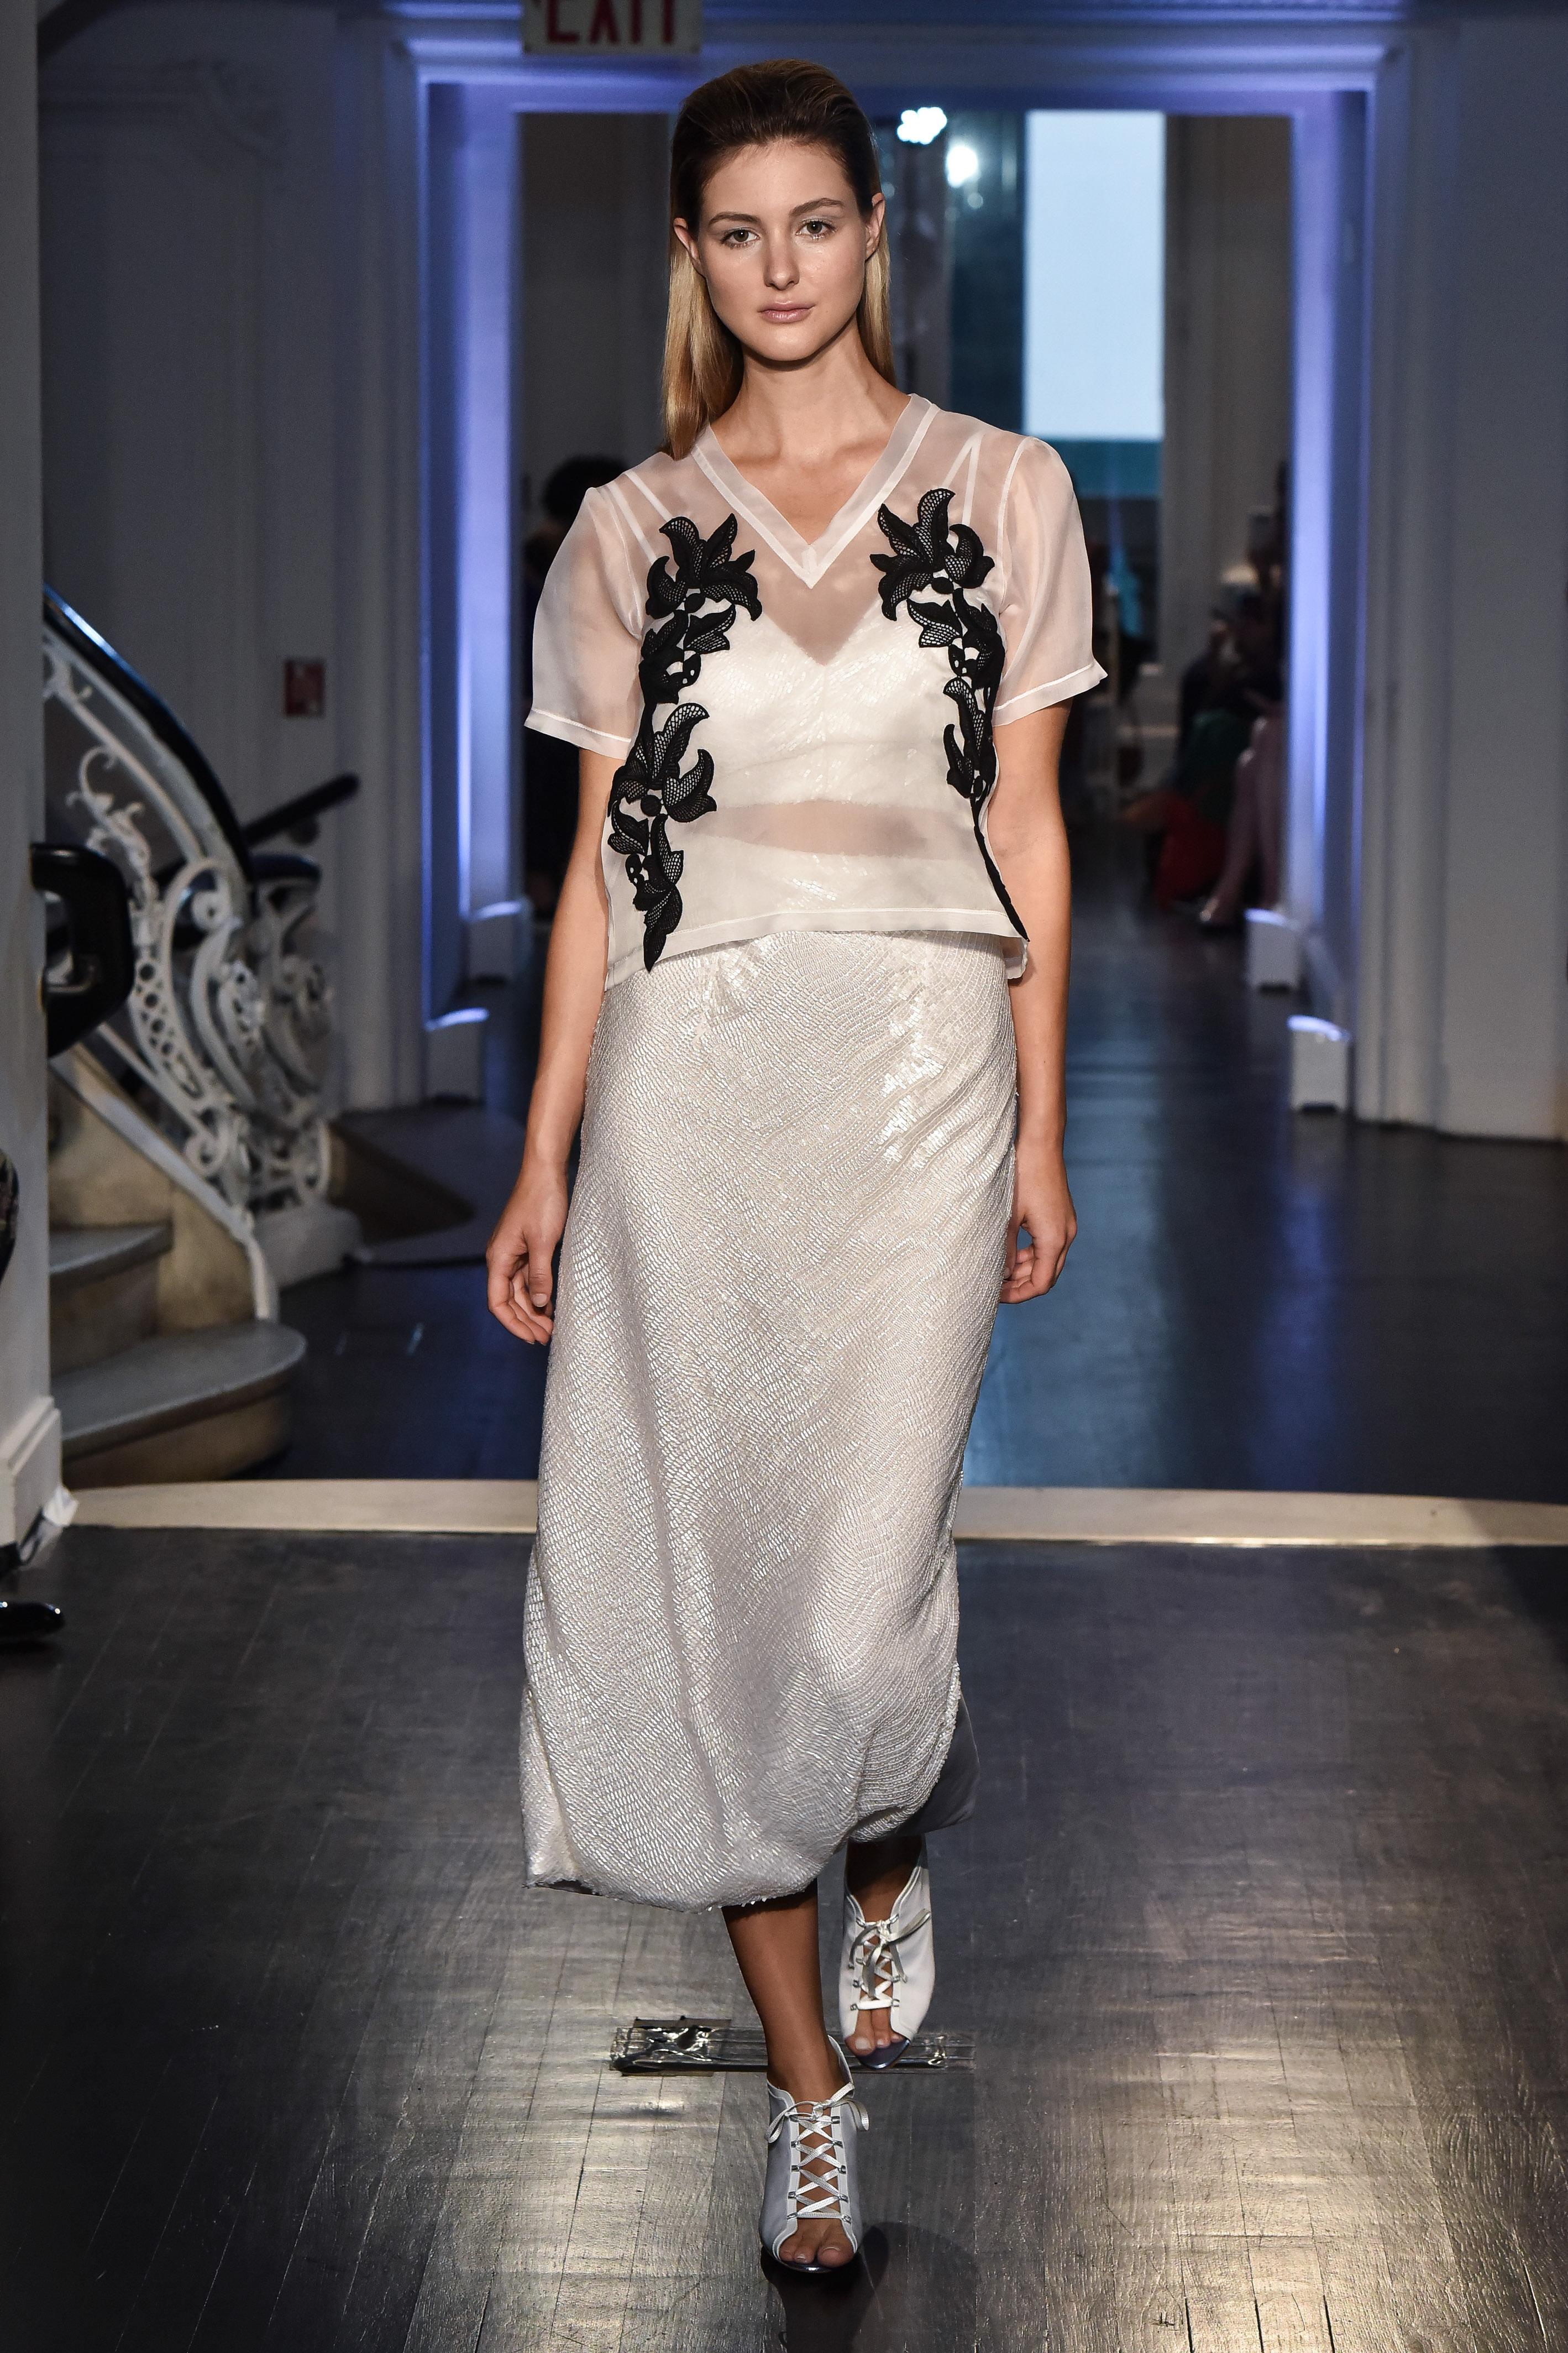 lakum wedding dress fall 2018 separates black applique